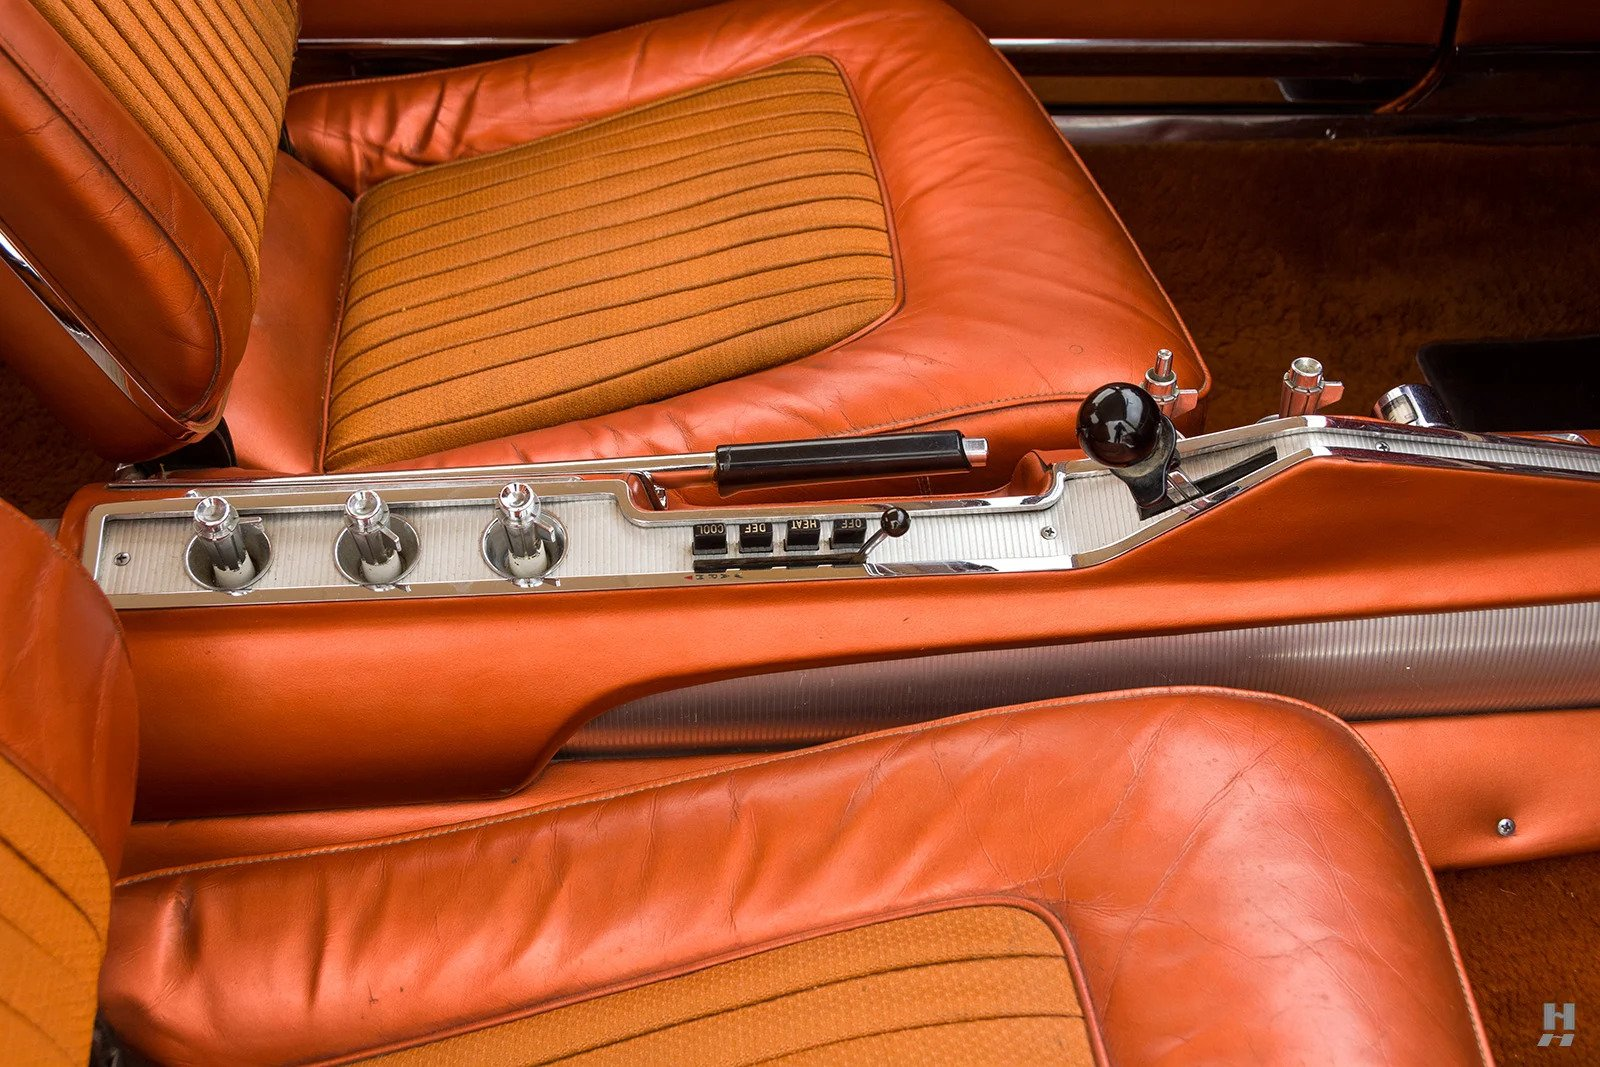 1963 Chrysler Turbine Car center console